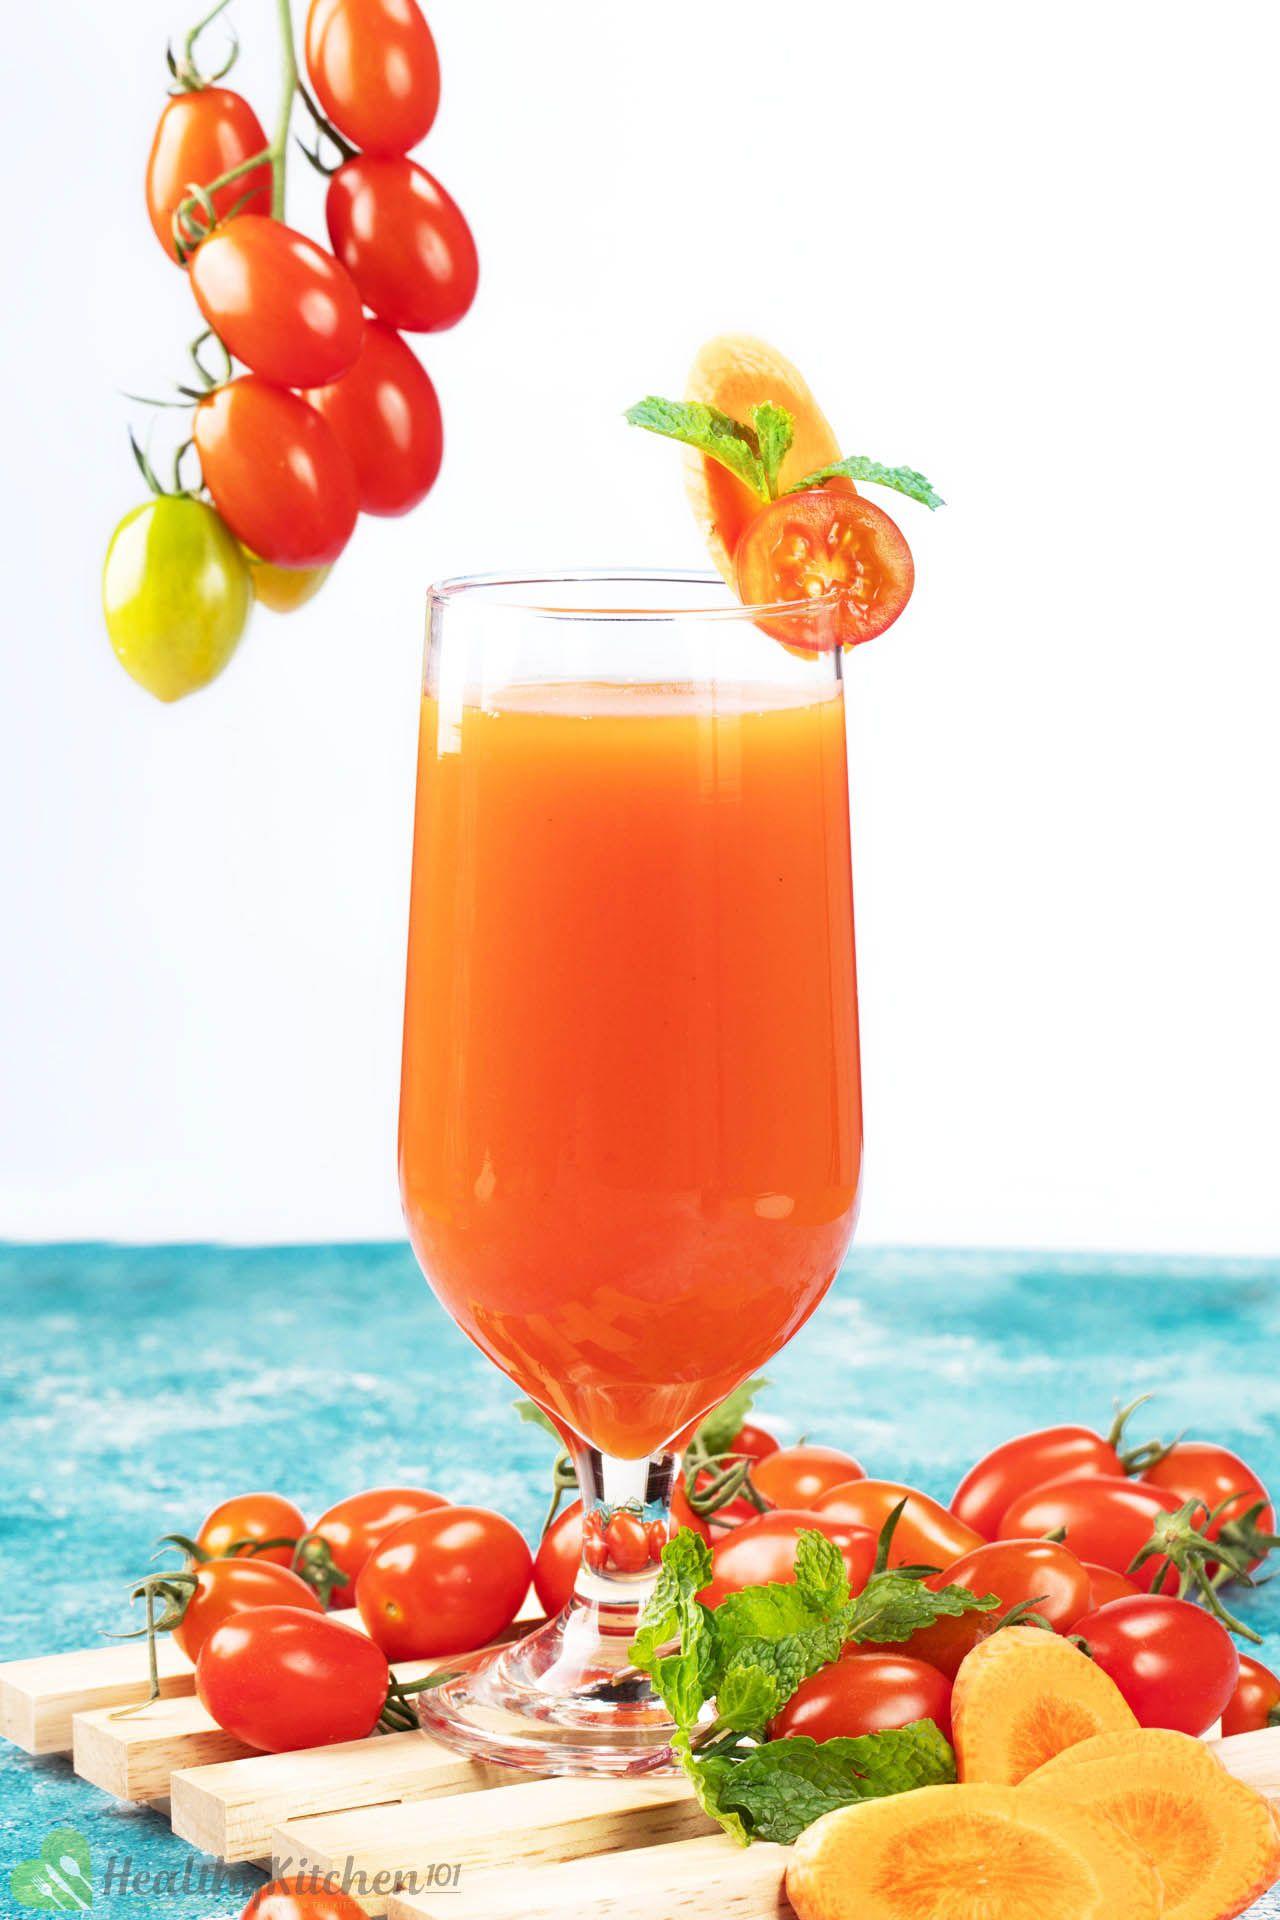 Carrot Tomato Juice Recipe